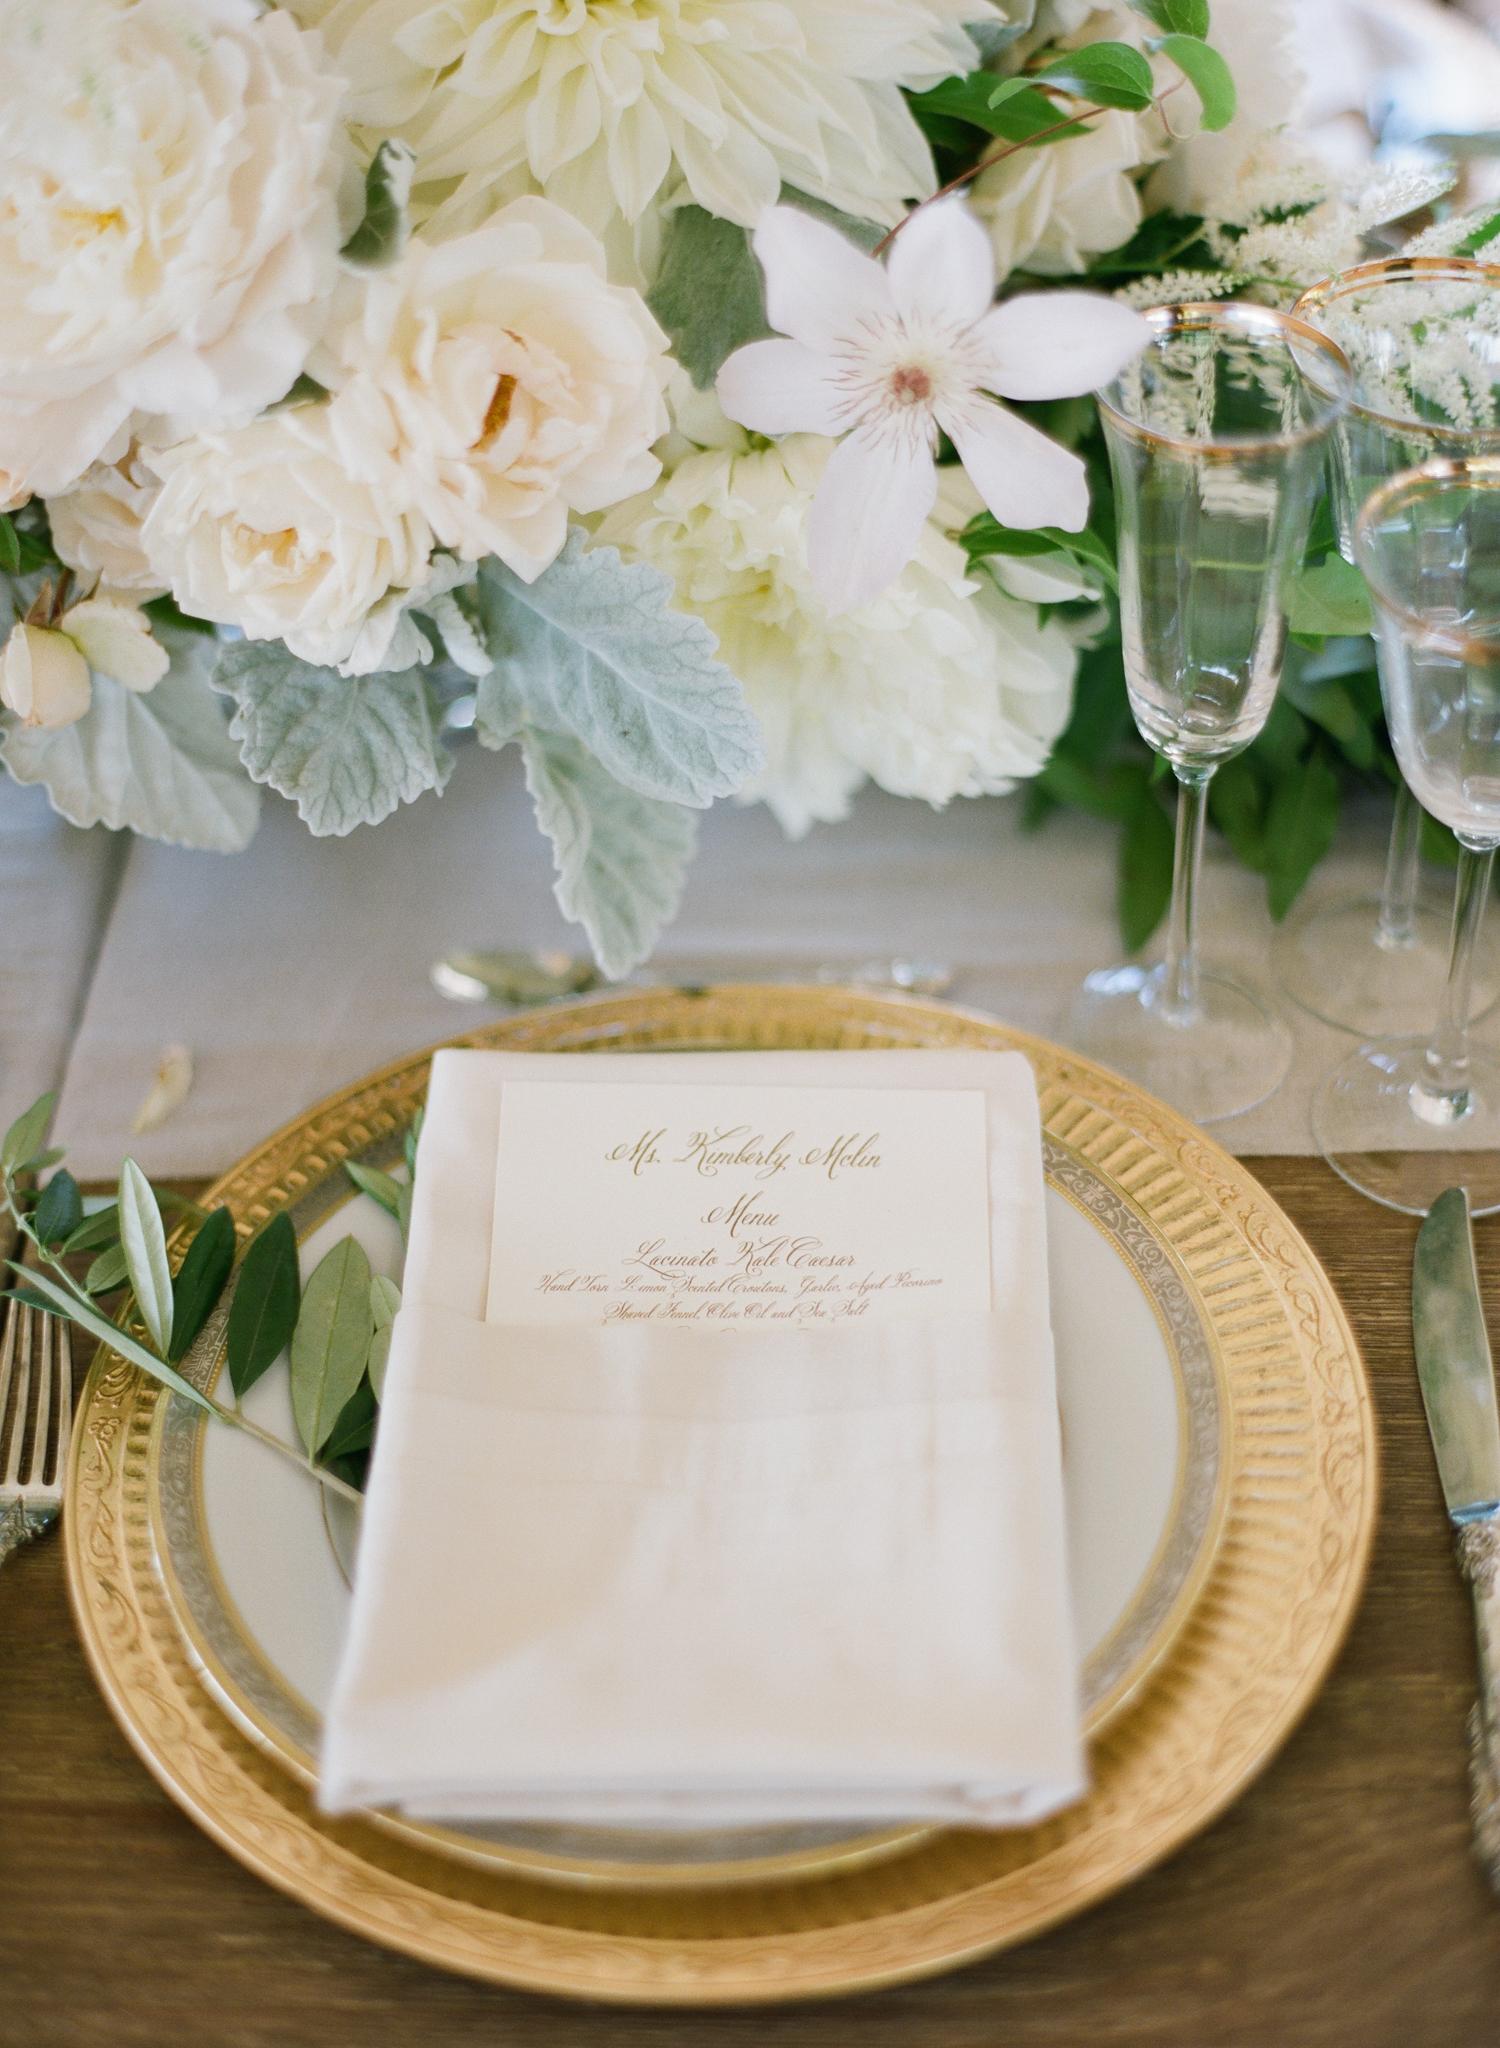 23 Private Estate Wedding Event Design by Joy Proctor.JPG